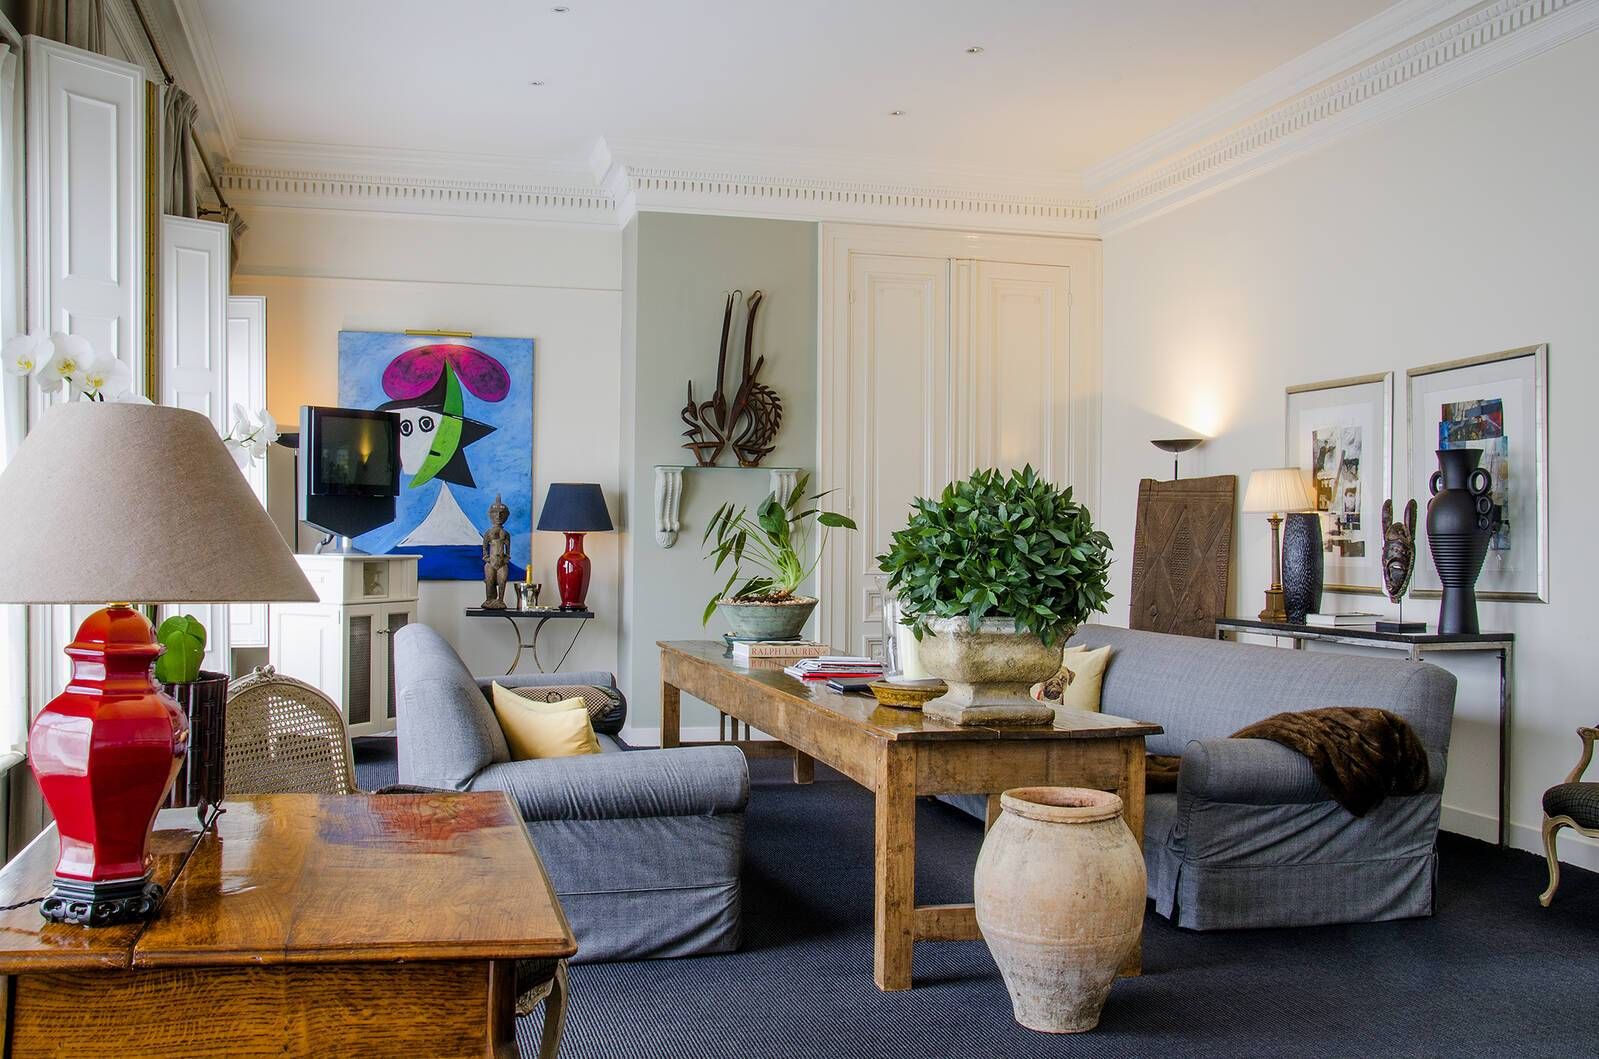 717 hotel executive suite picasso amsterdam